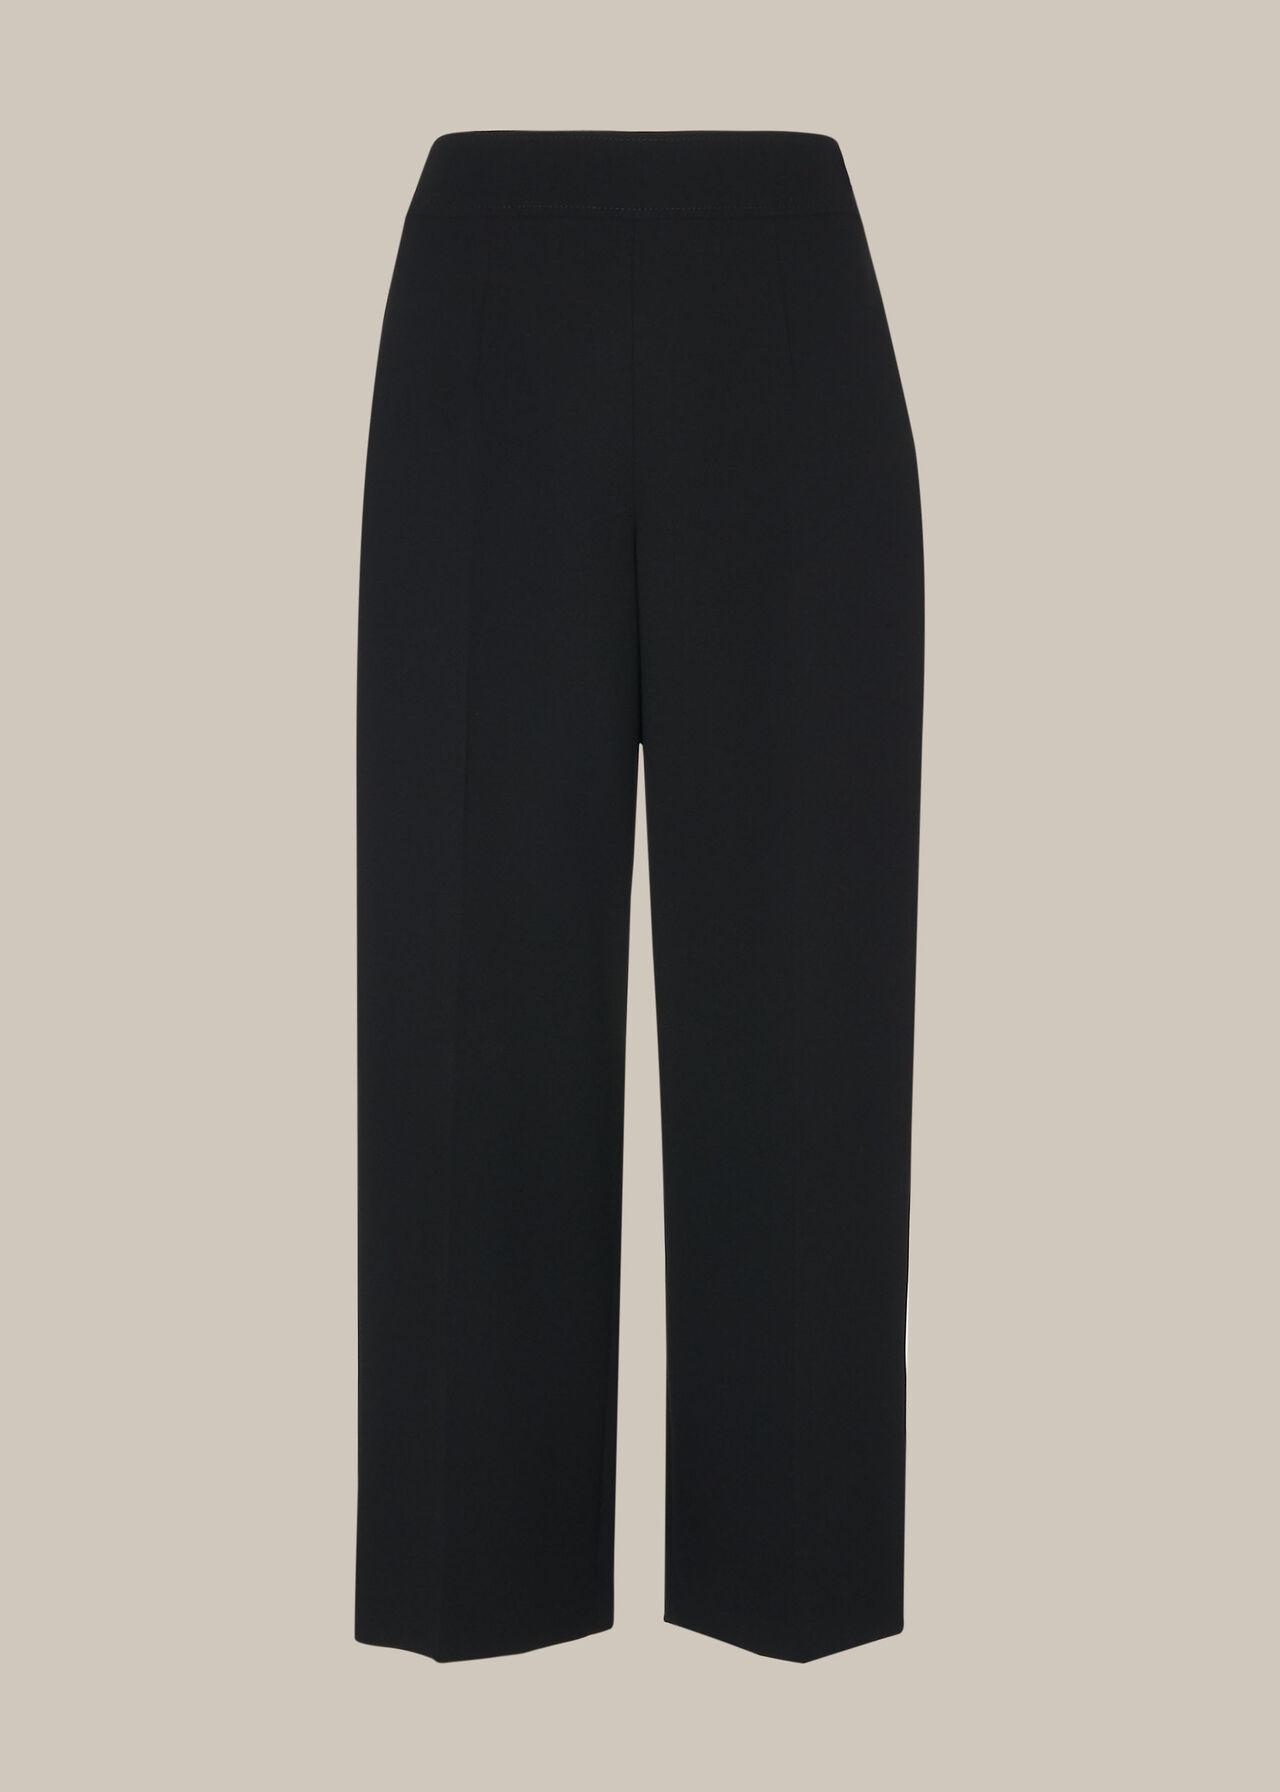 Wide Leg Crop Trouser